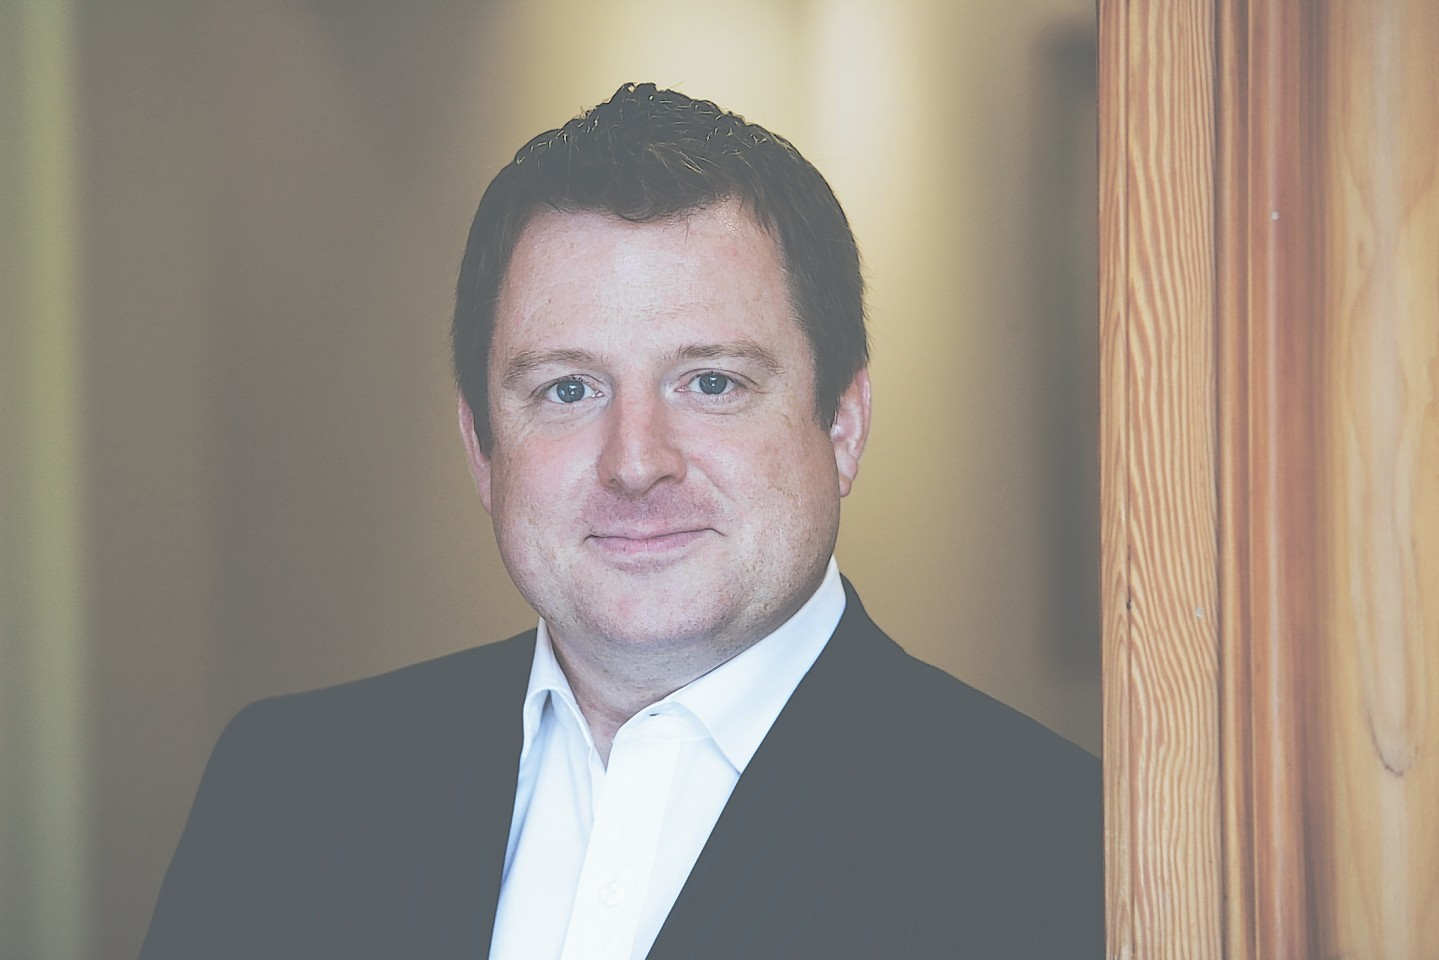 Mattioli Woods employee benefits director Alan Fergusson